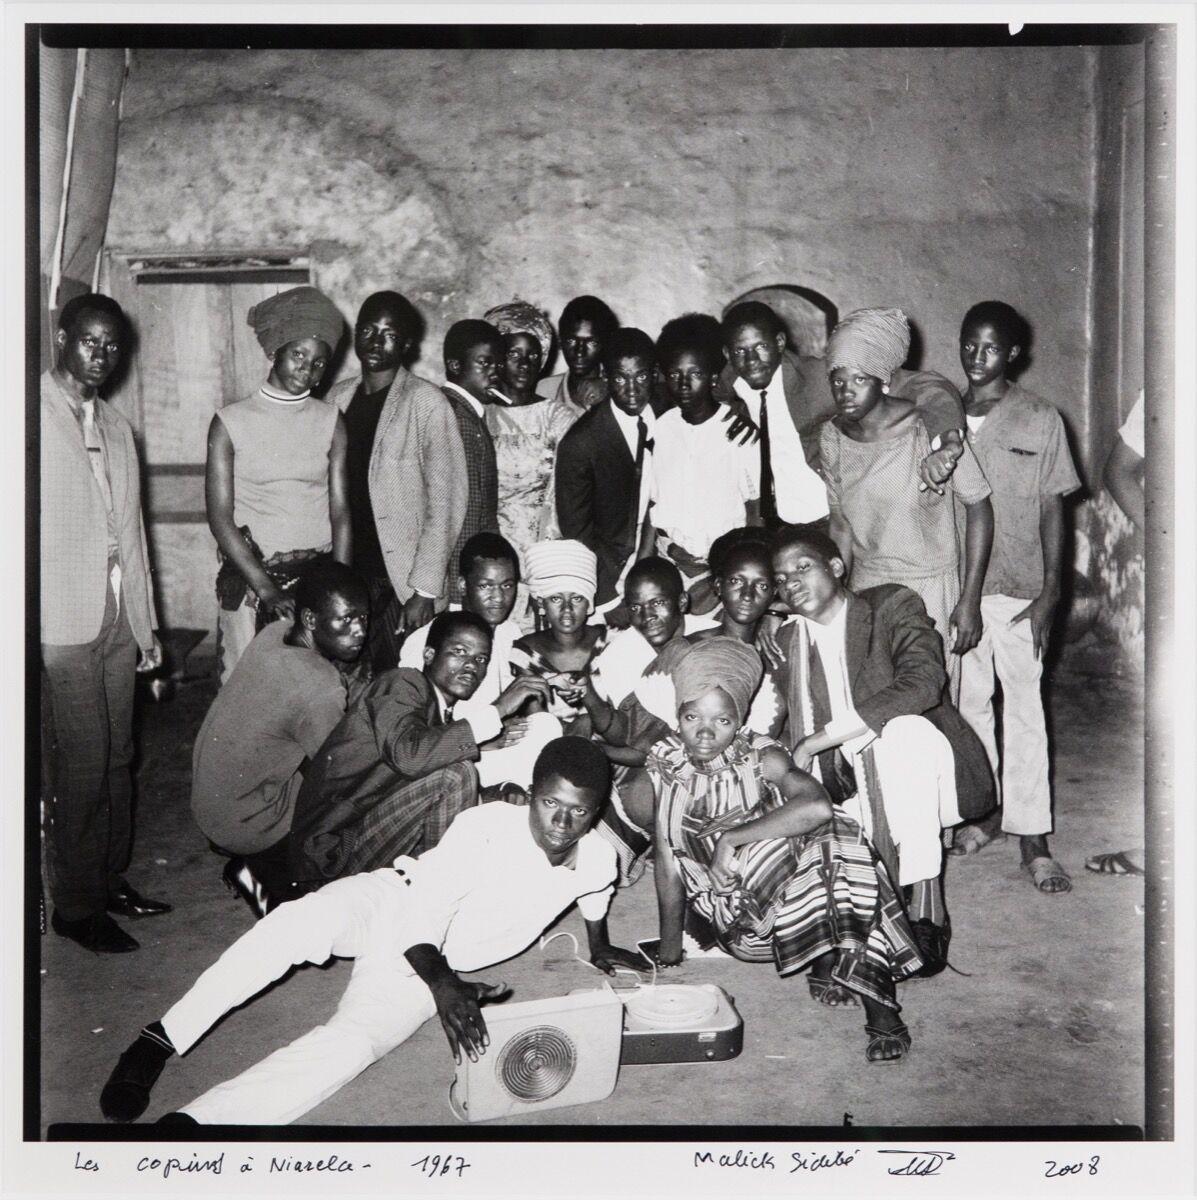 Malick Sidibé, Les copins à Niarela, 1967/2008. Courtesy of Jack Shaiman Gallery.